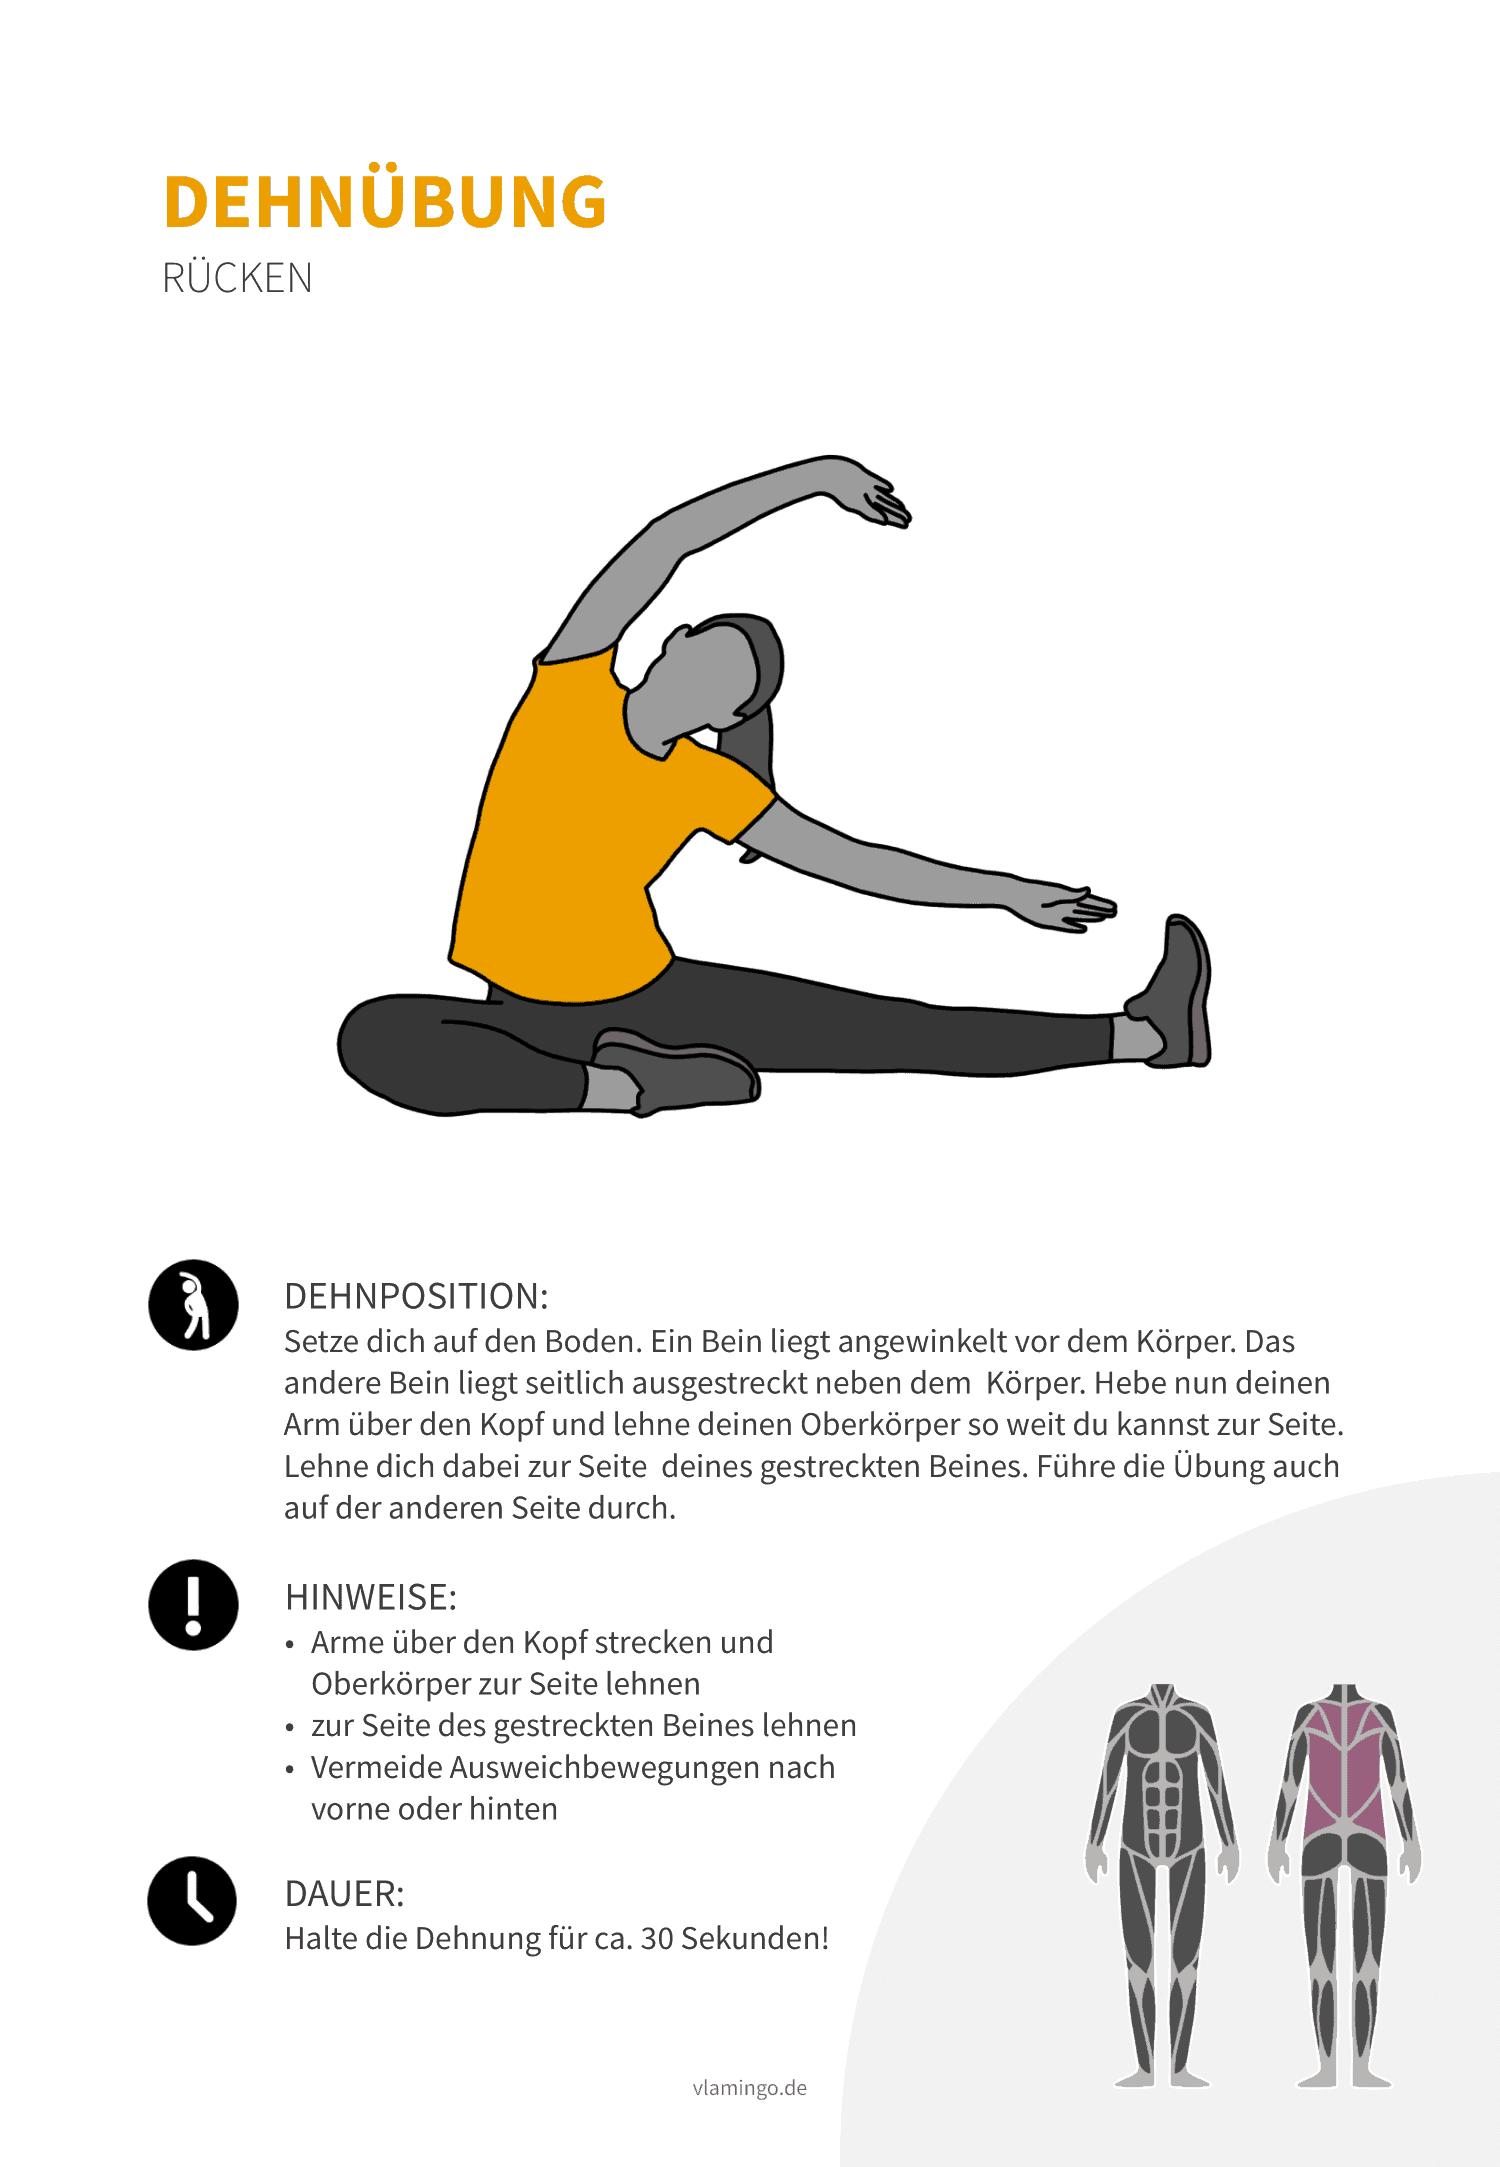 Dehnübung 016 - Rücken